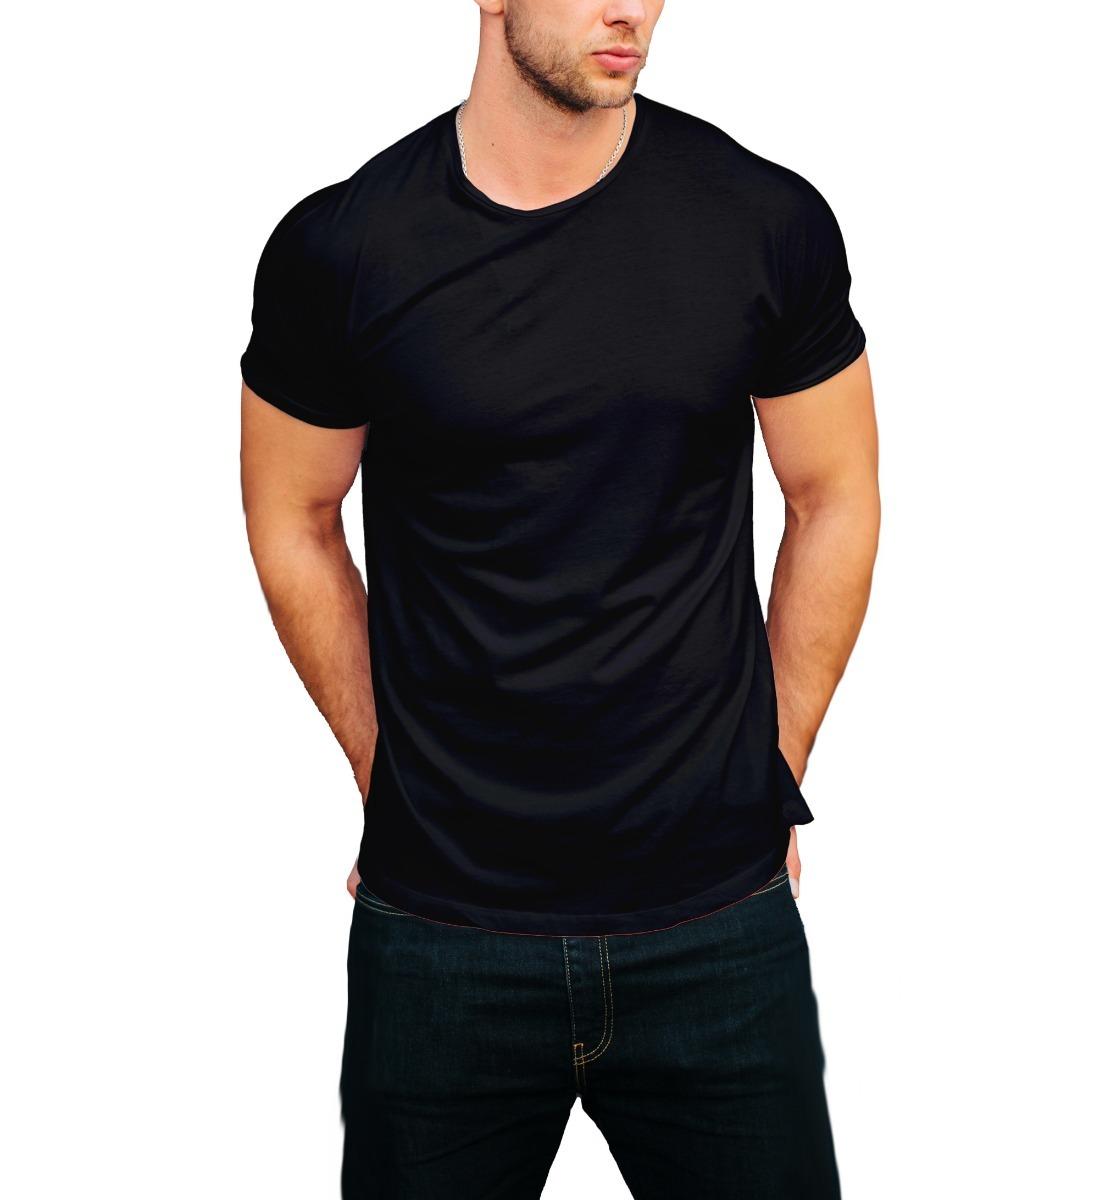 7a273edbef camiseta lisa gola olímpica preta malha pv anti-pilling. Carregando zoom.